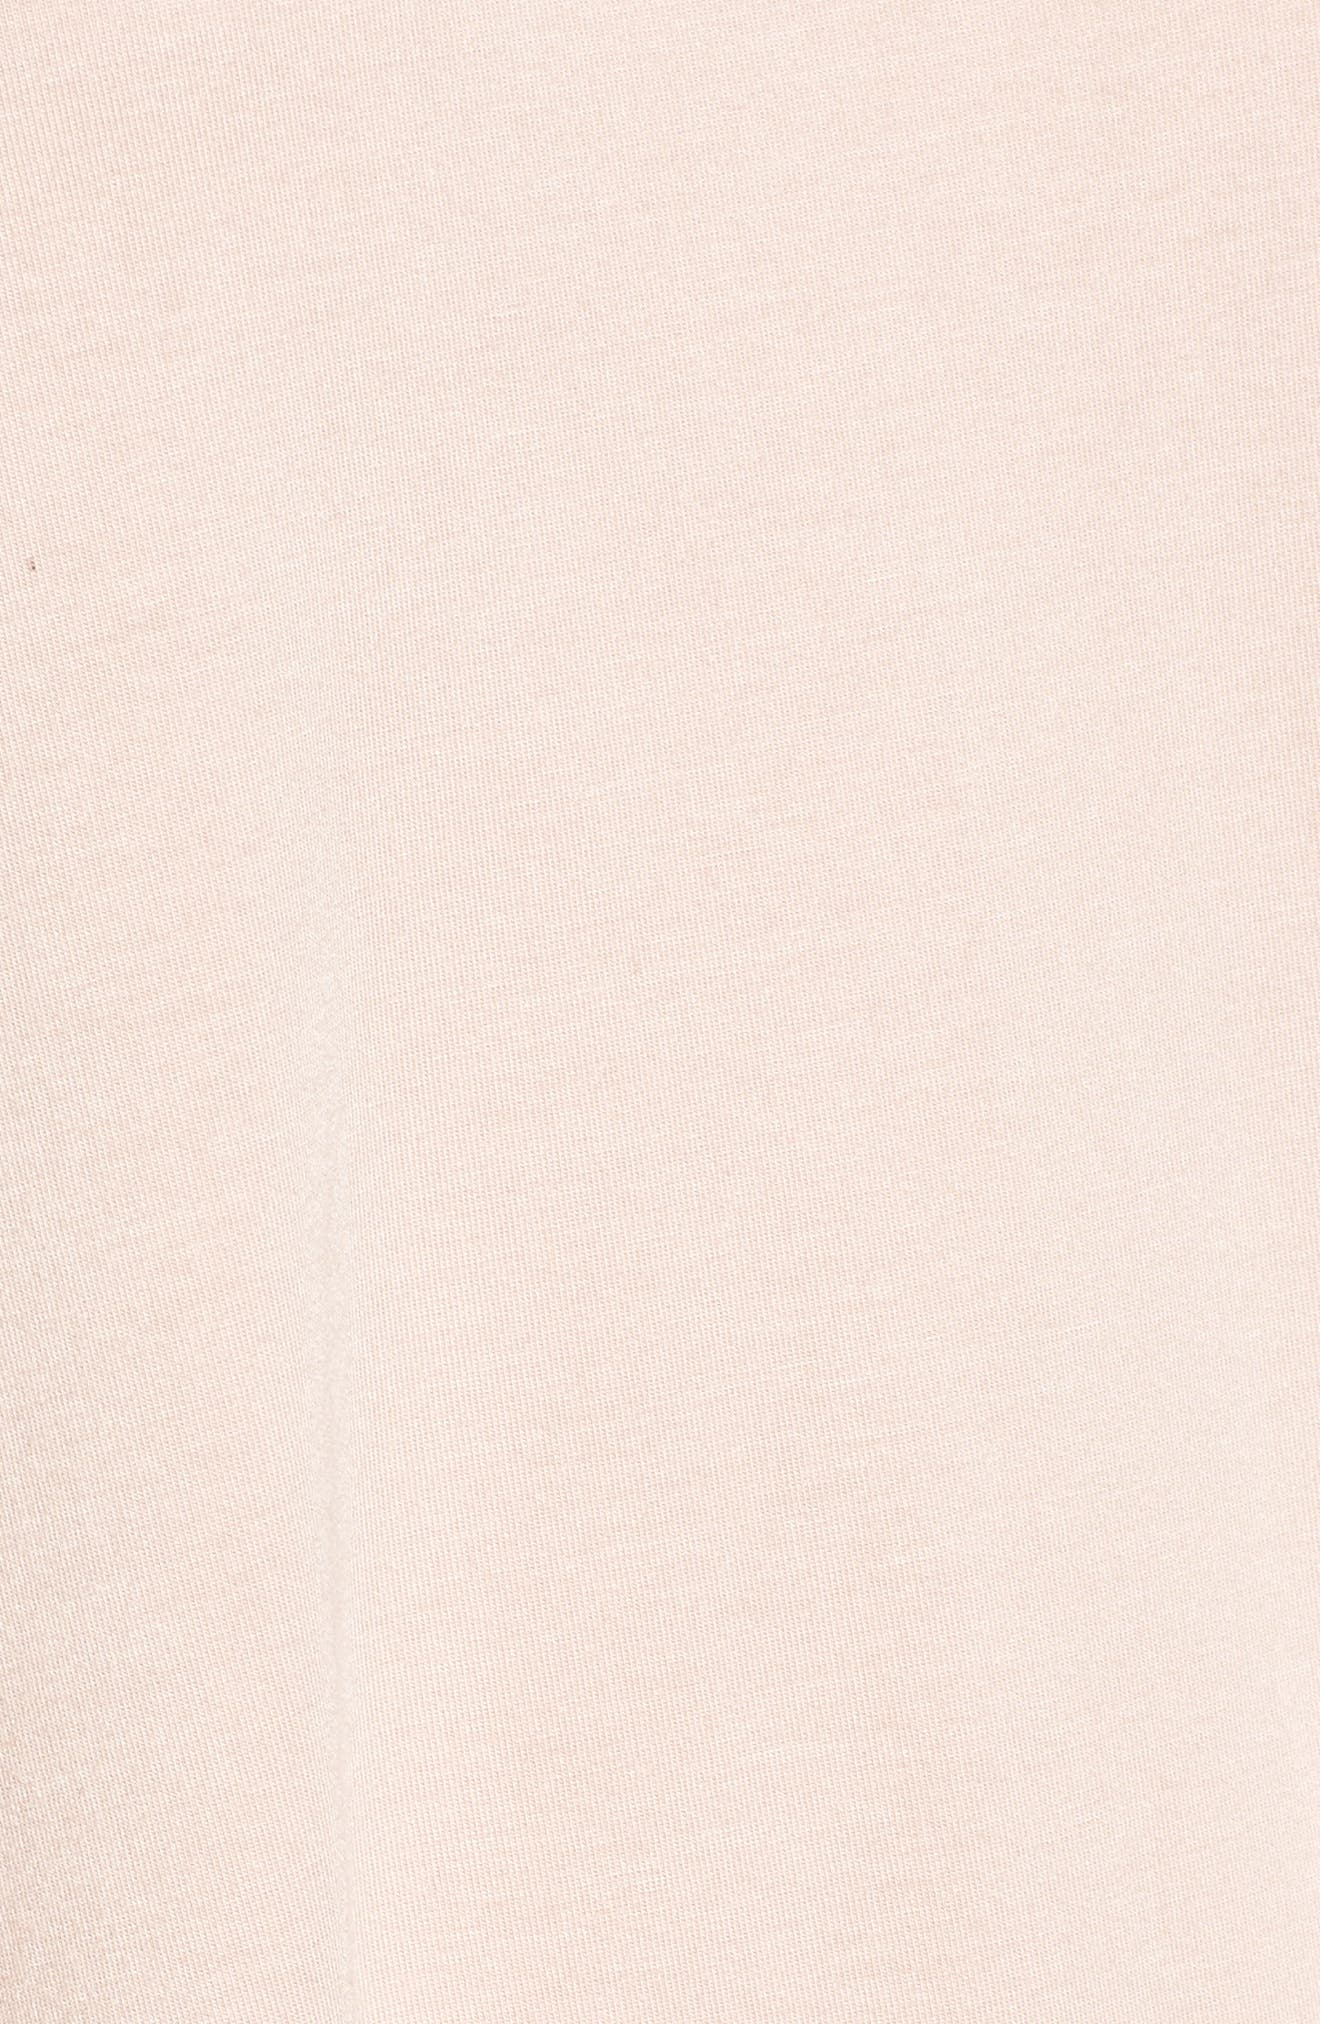 Long Sleeve Knit Tunic,                             Alternate thumbnail 5, color,                             680